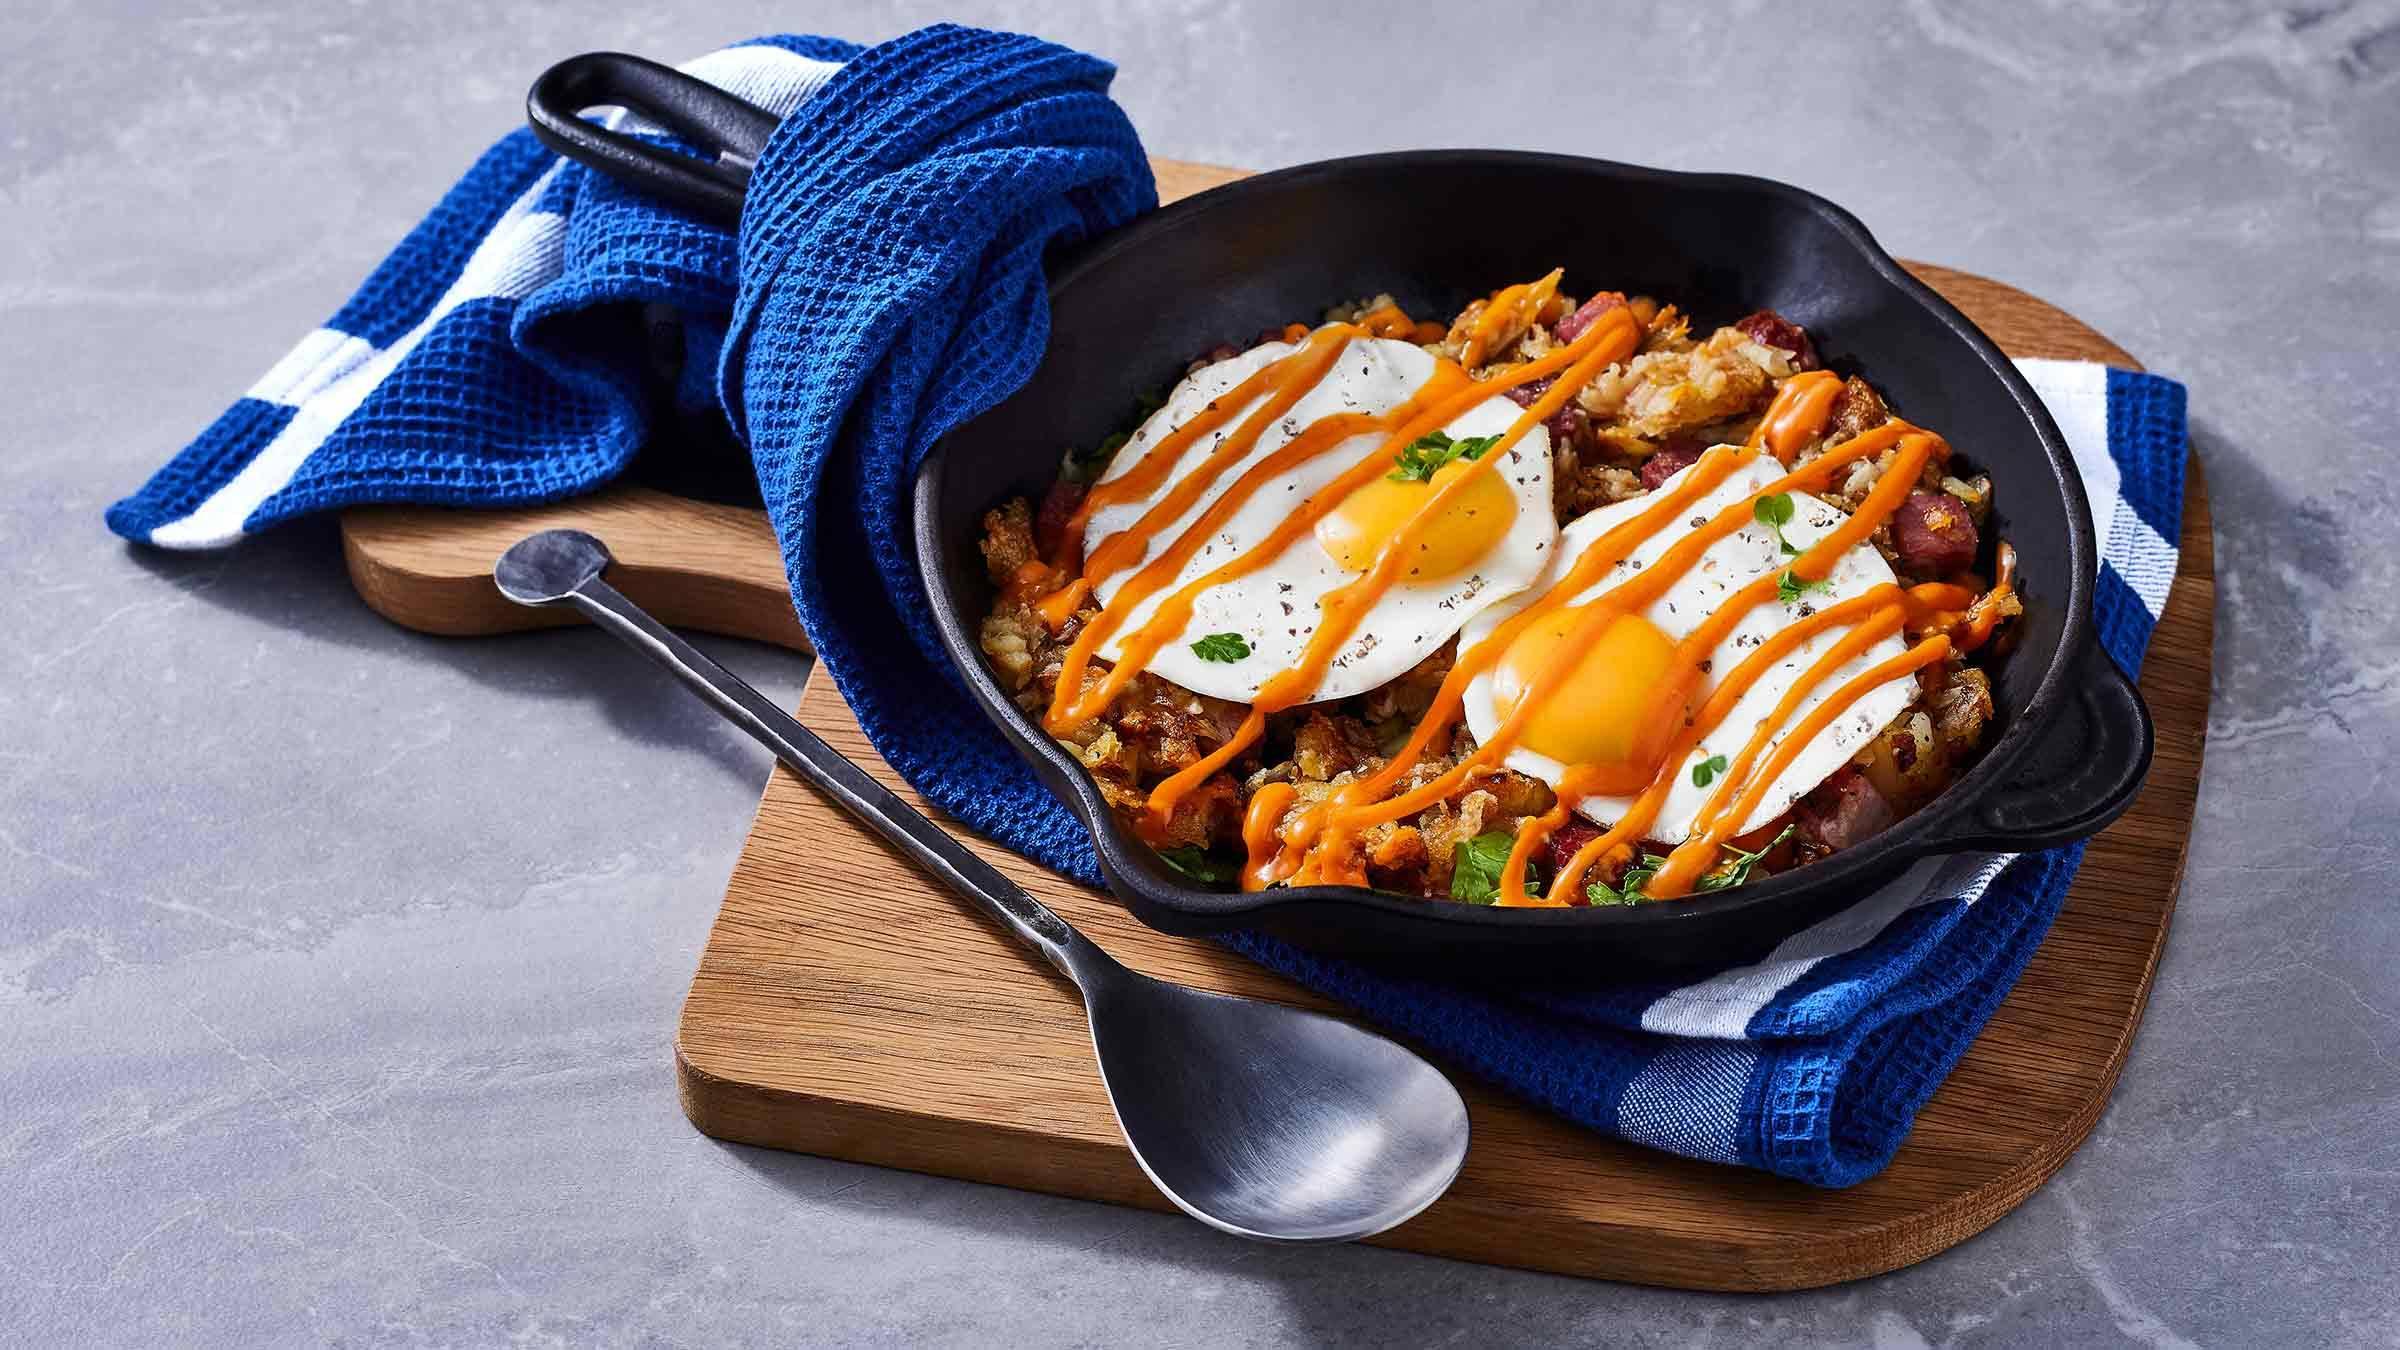 Corned Beef Hash and Eggs with Creamy Sriracha Sauce